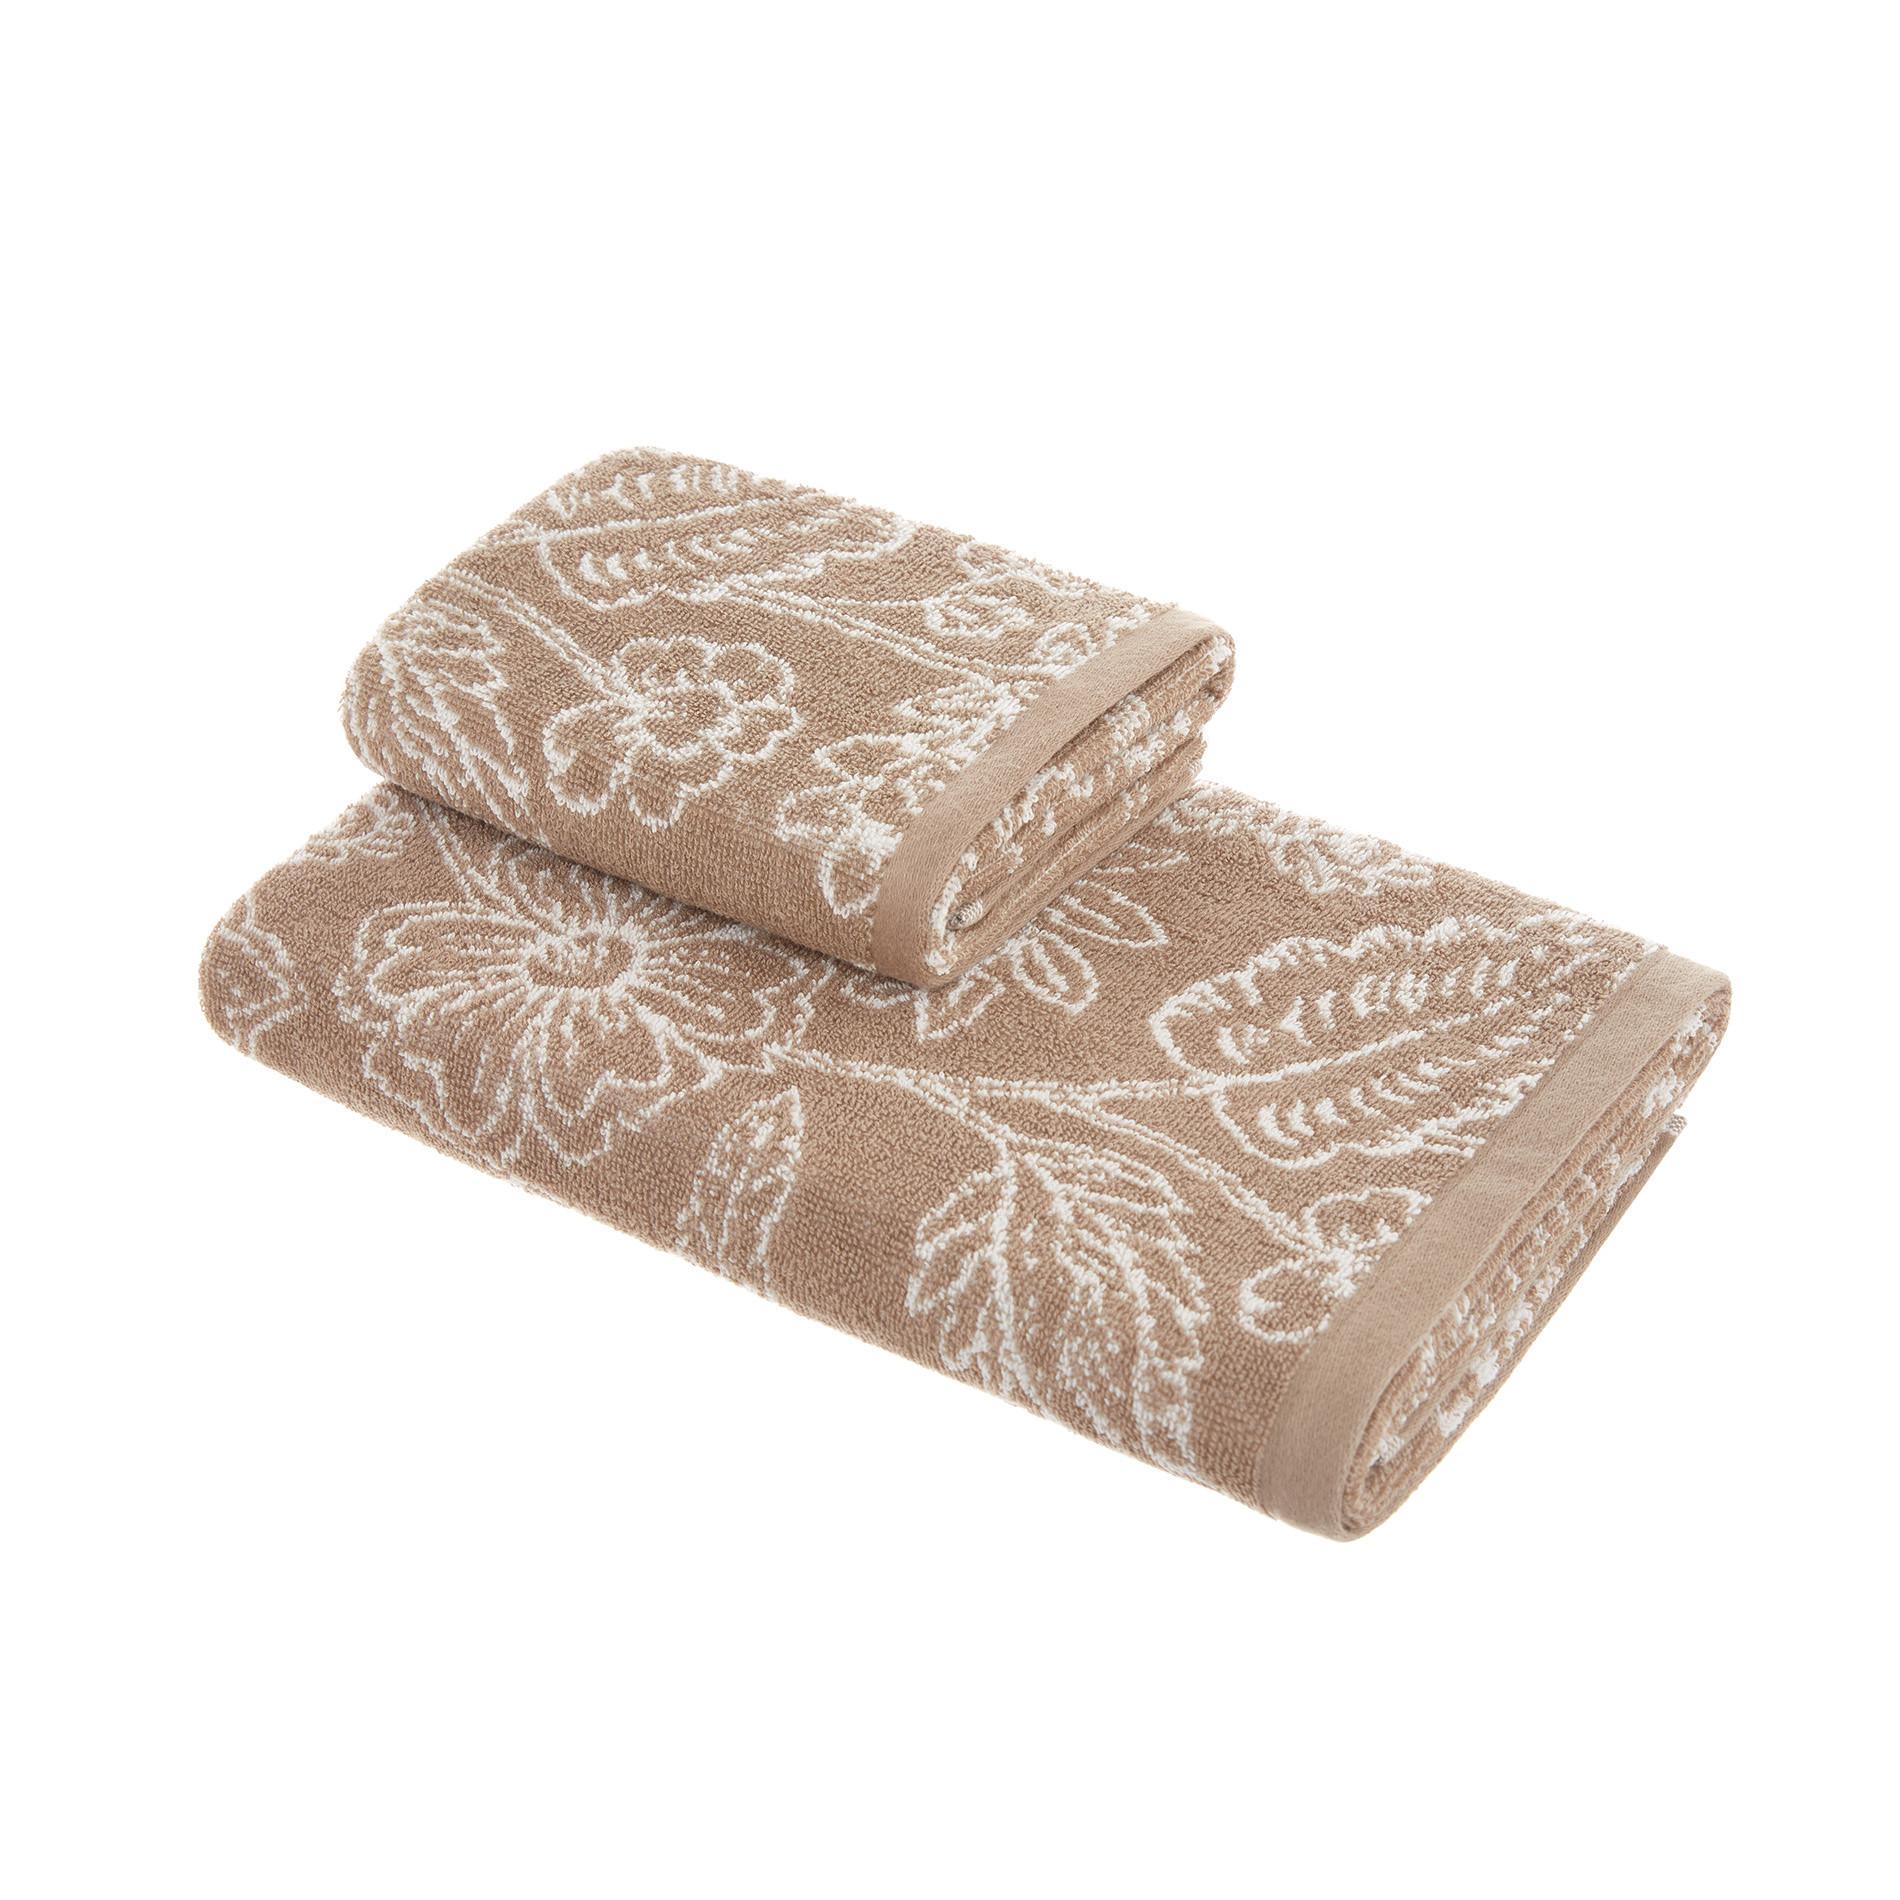 Asciugamano spugna di cotone fantasia floreale, Beige, large image number 0